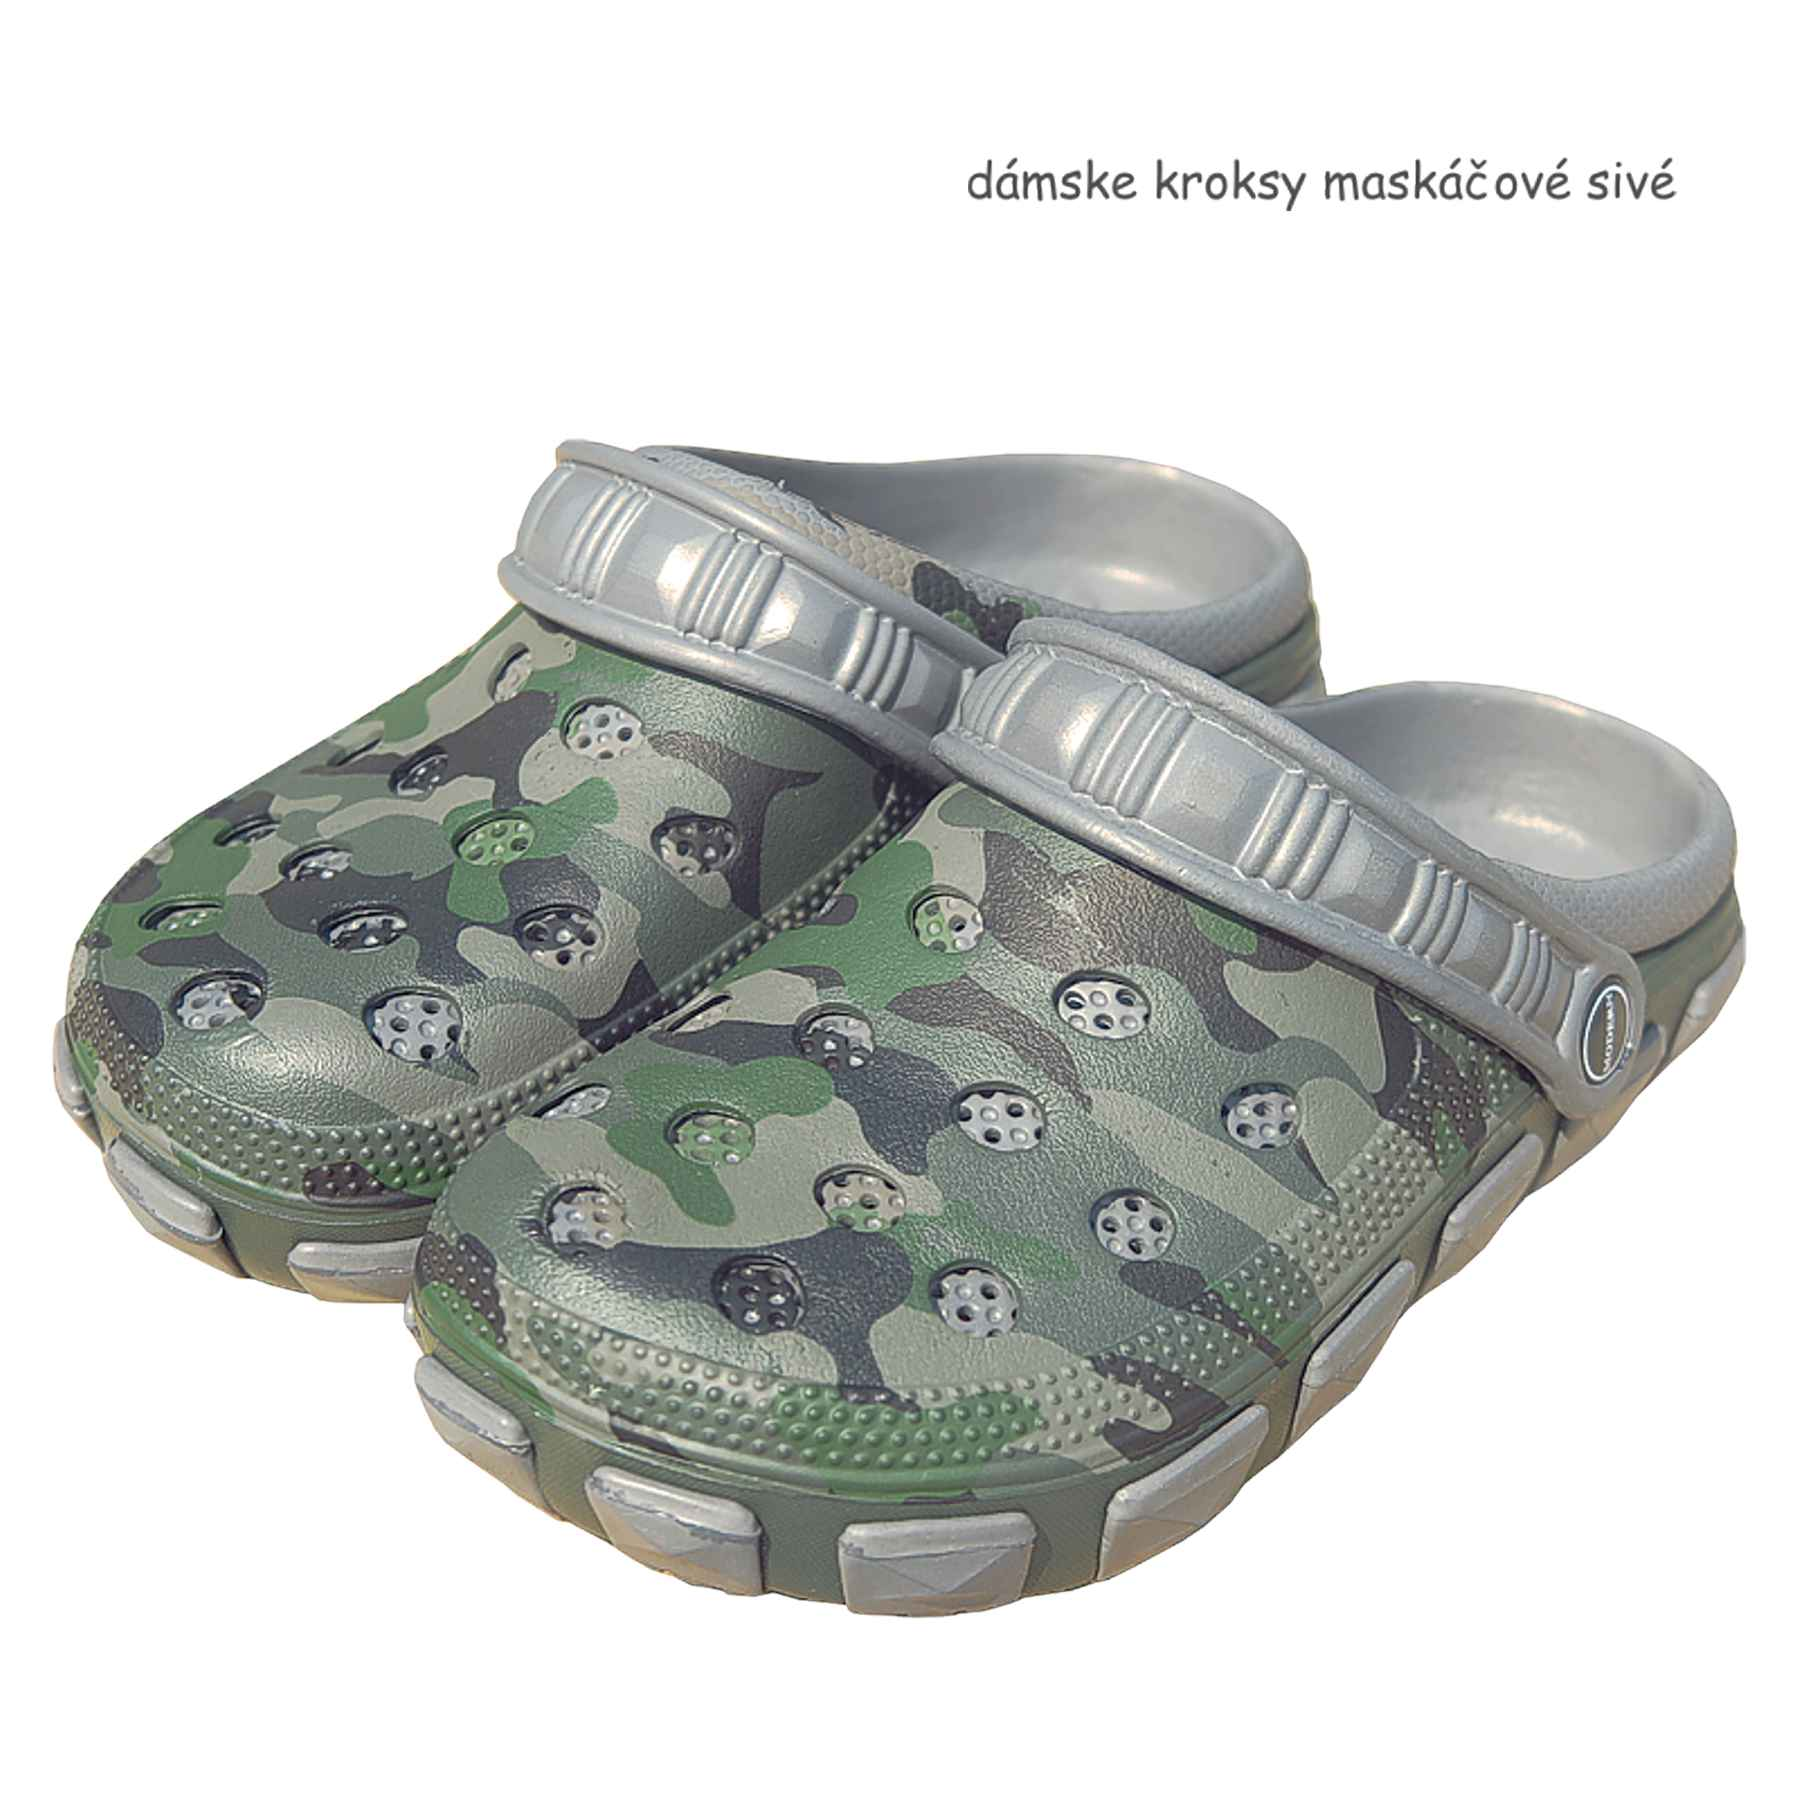 ad6be7694f389 dámske kroksy maskáčové sivé | TifanTEX obuv